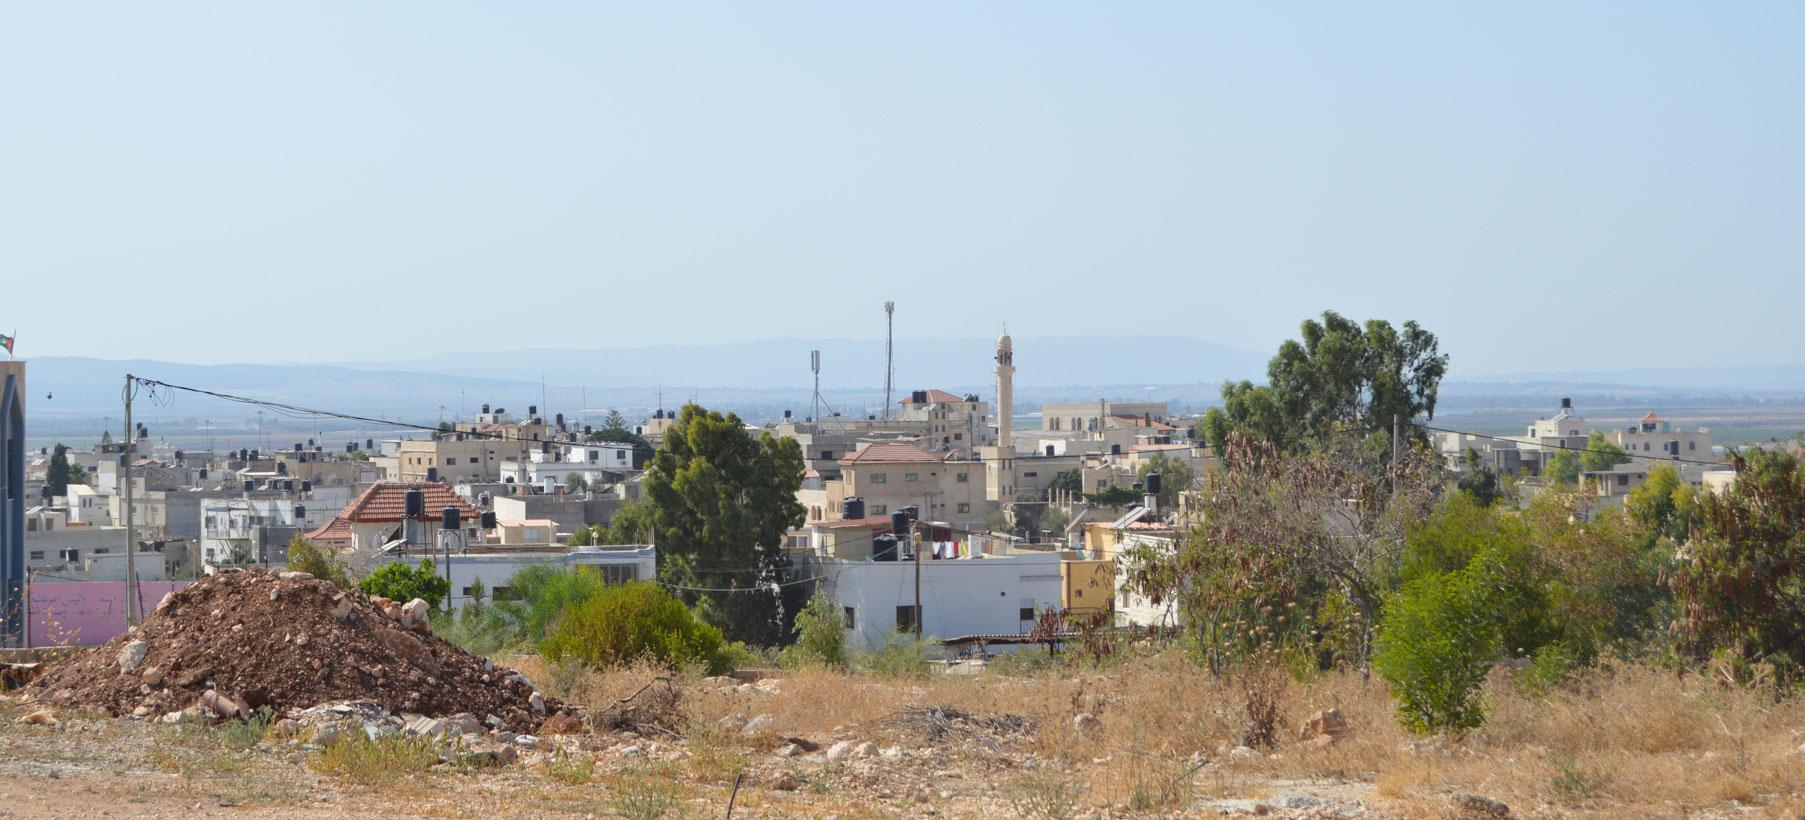 Jalama Palestine